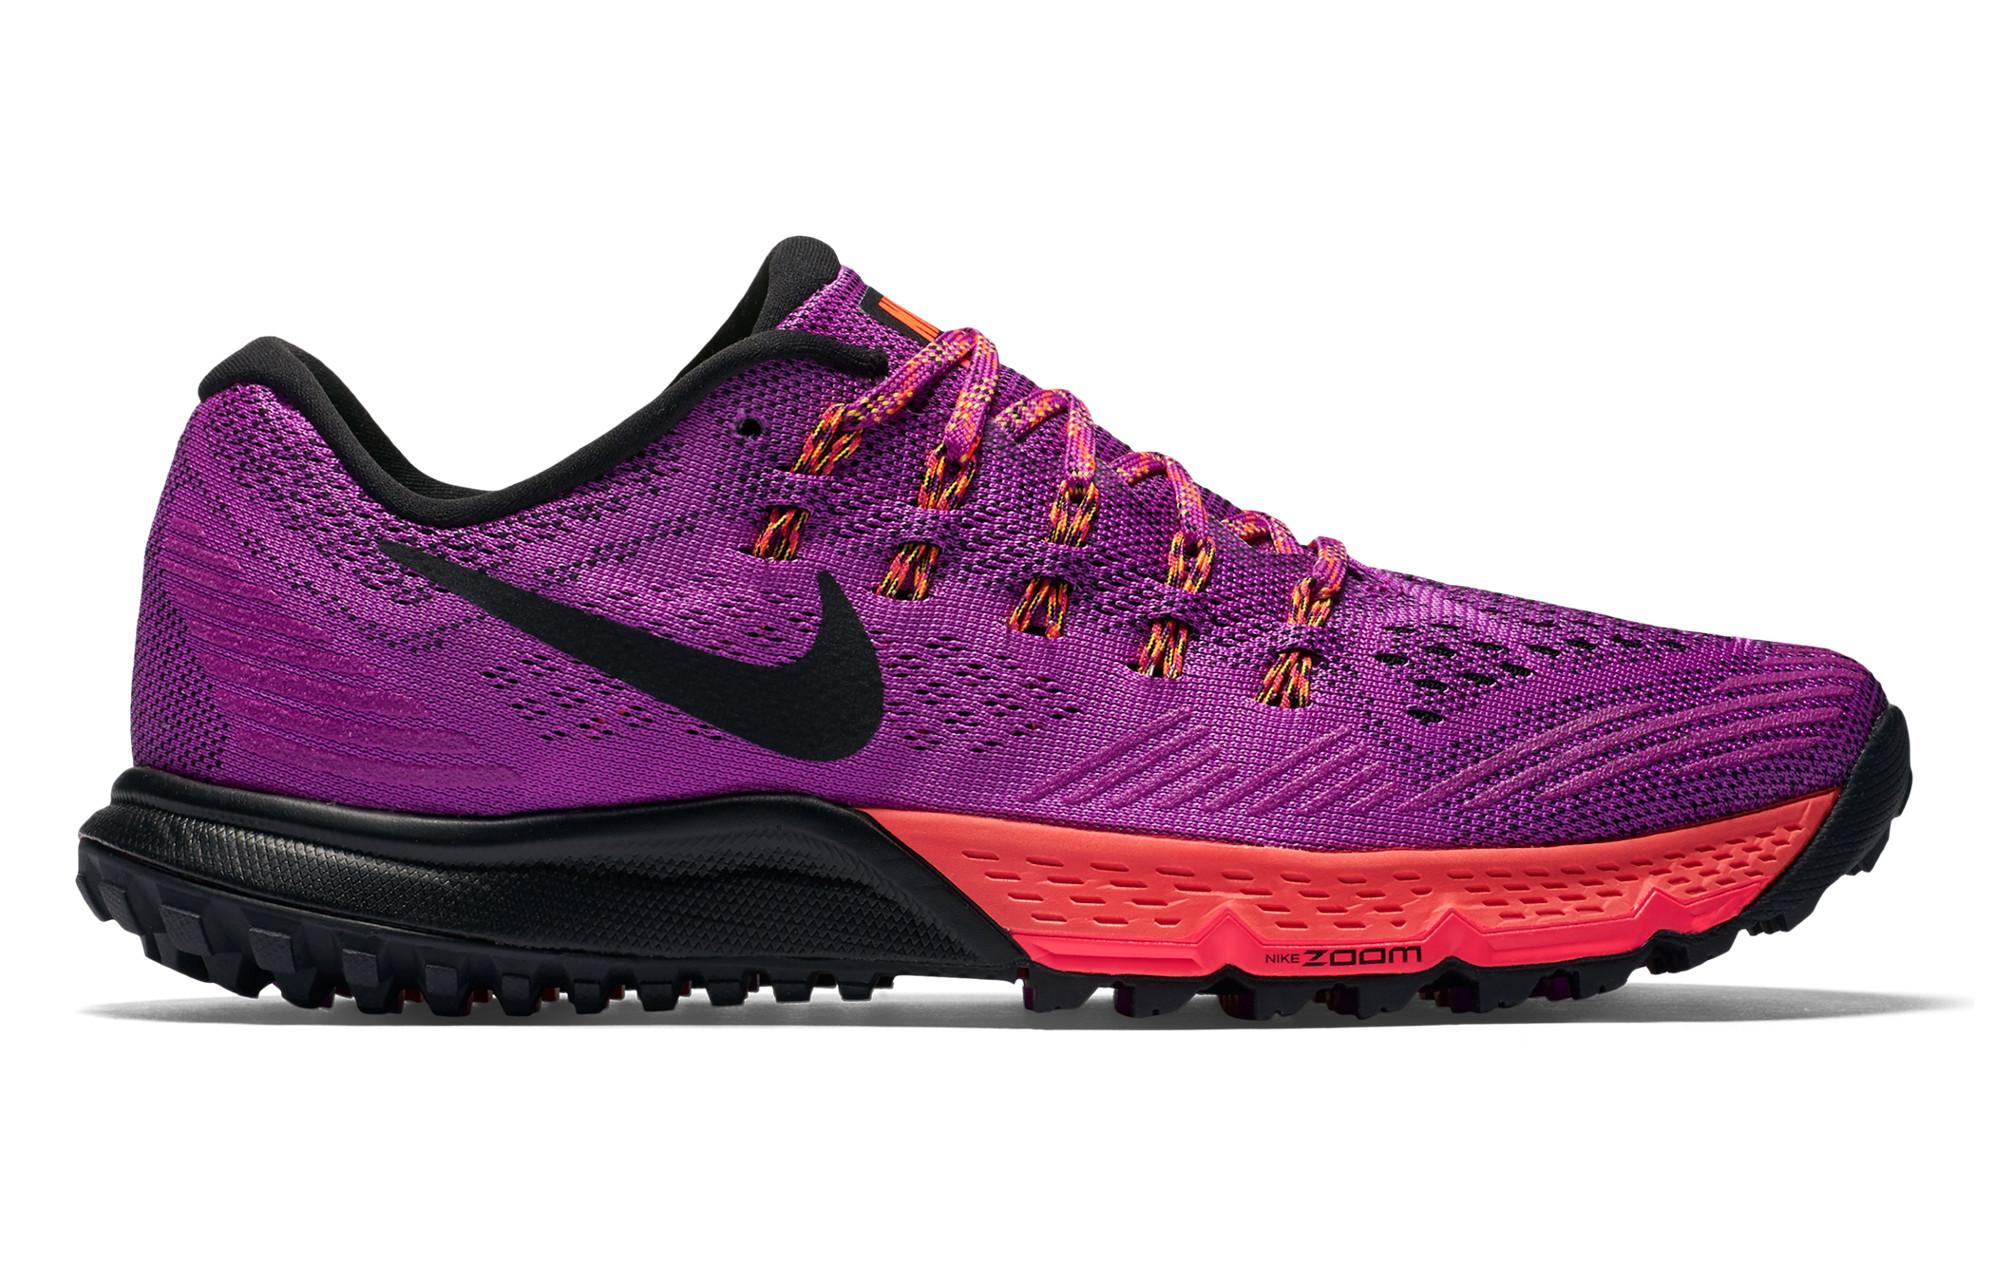 half off 668cd fdb12 Chaussures de Trail Femme Nike ZOOM TERRA KIGER 3 Violet